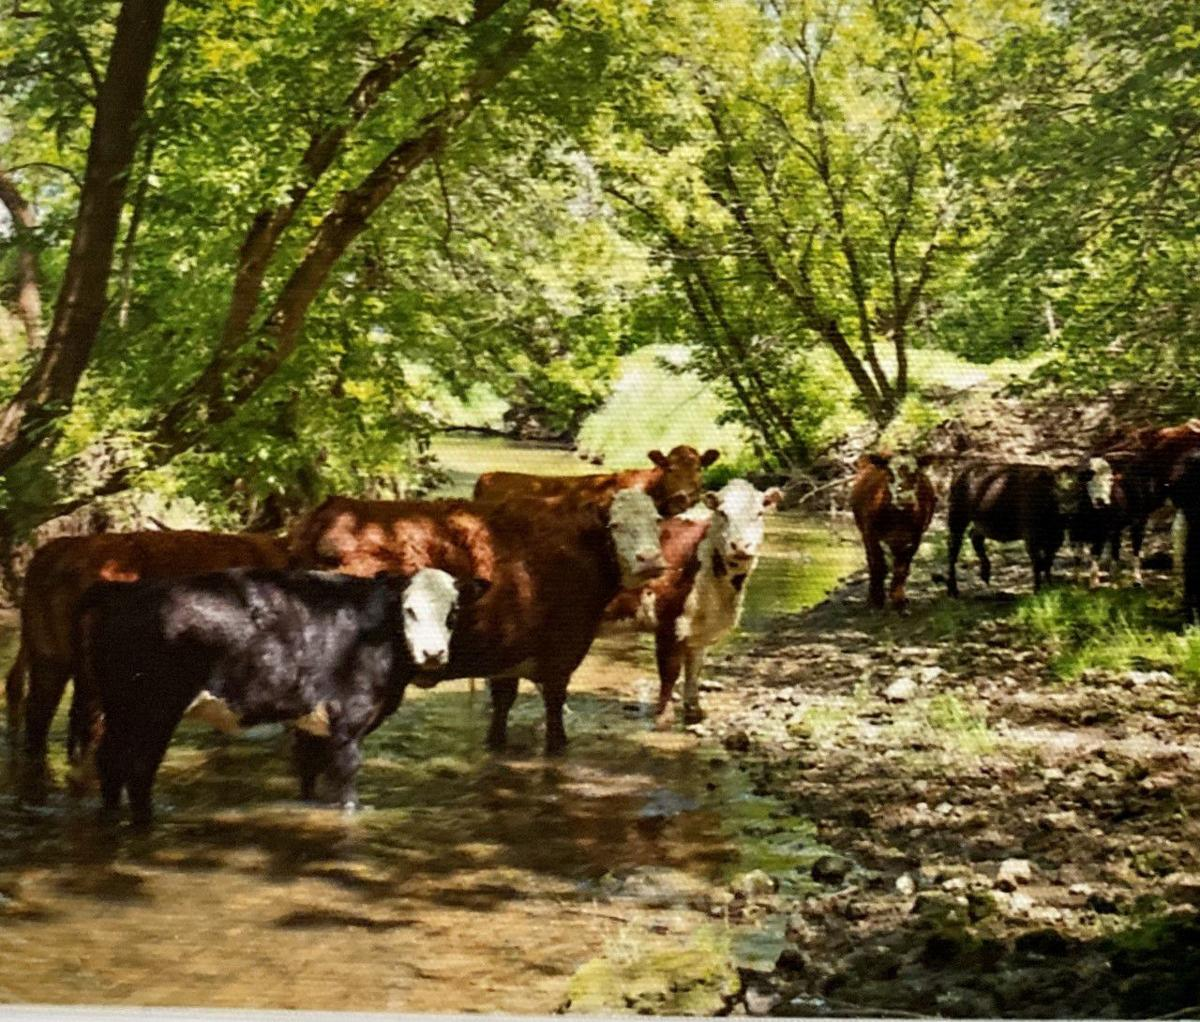 Dale Kilburg's cows